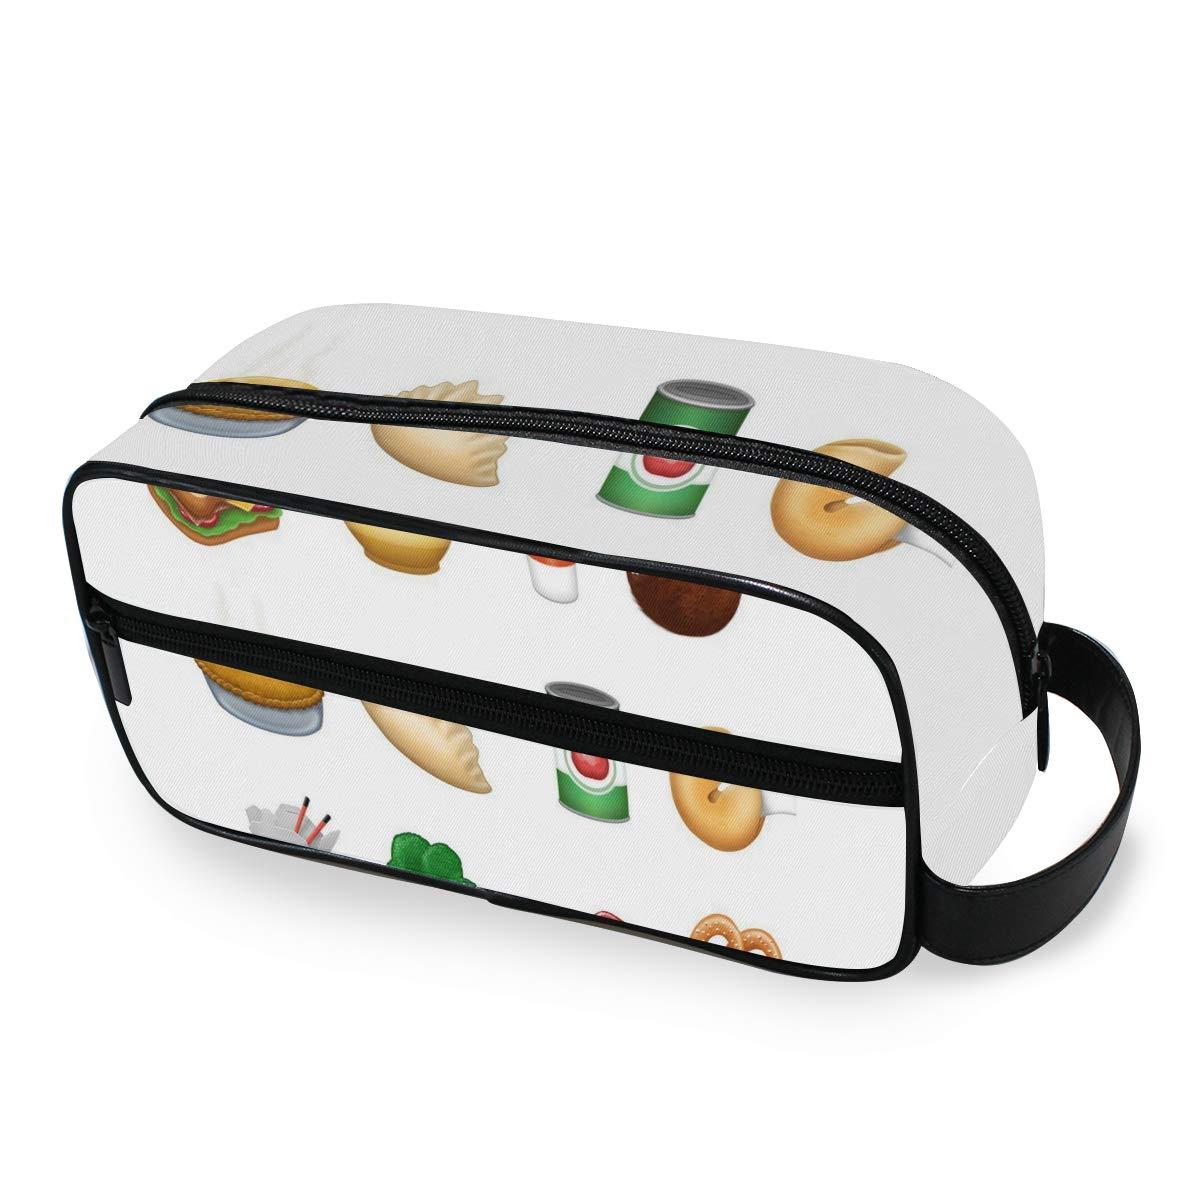 Portable Travel Toiletry Bag,New Food Pie Dumpling Sandwich Chinese Take Cosmetic Organizer for Men Women Multifunctional Bathroom Shower Shaving Bags